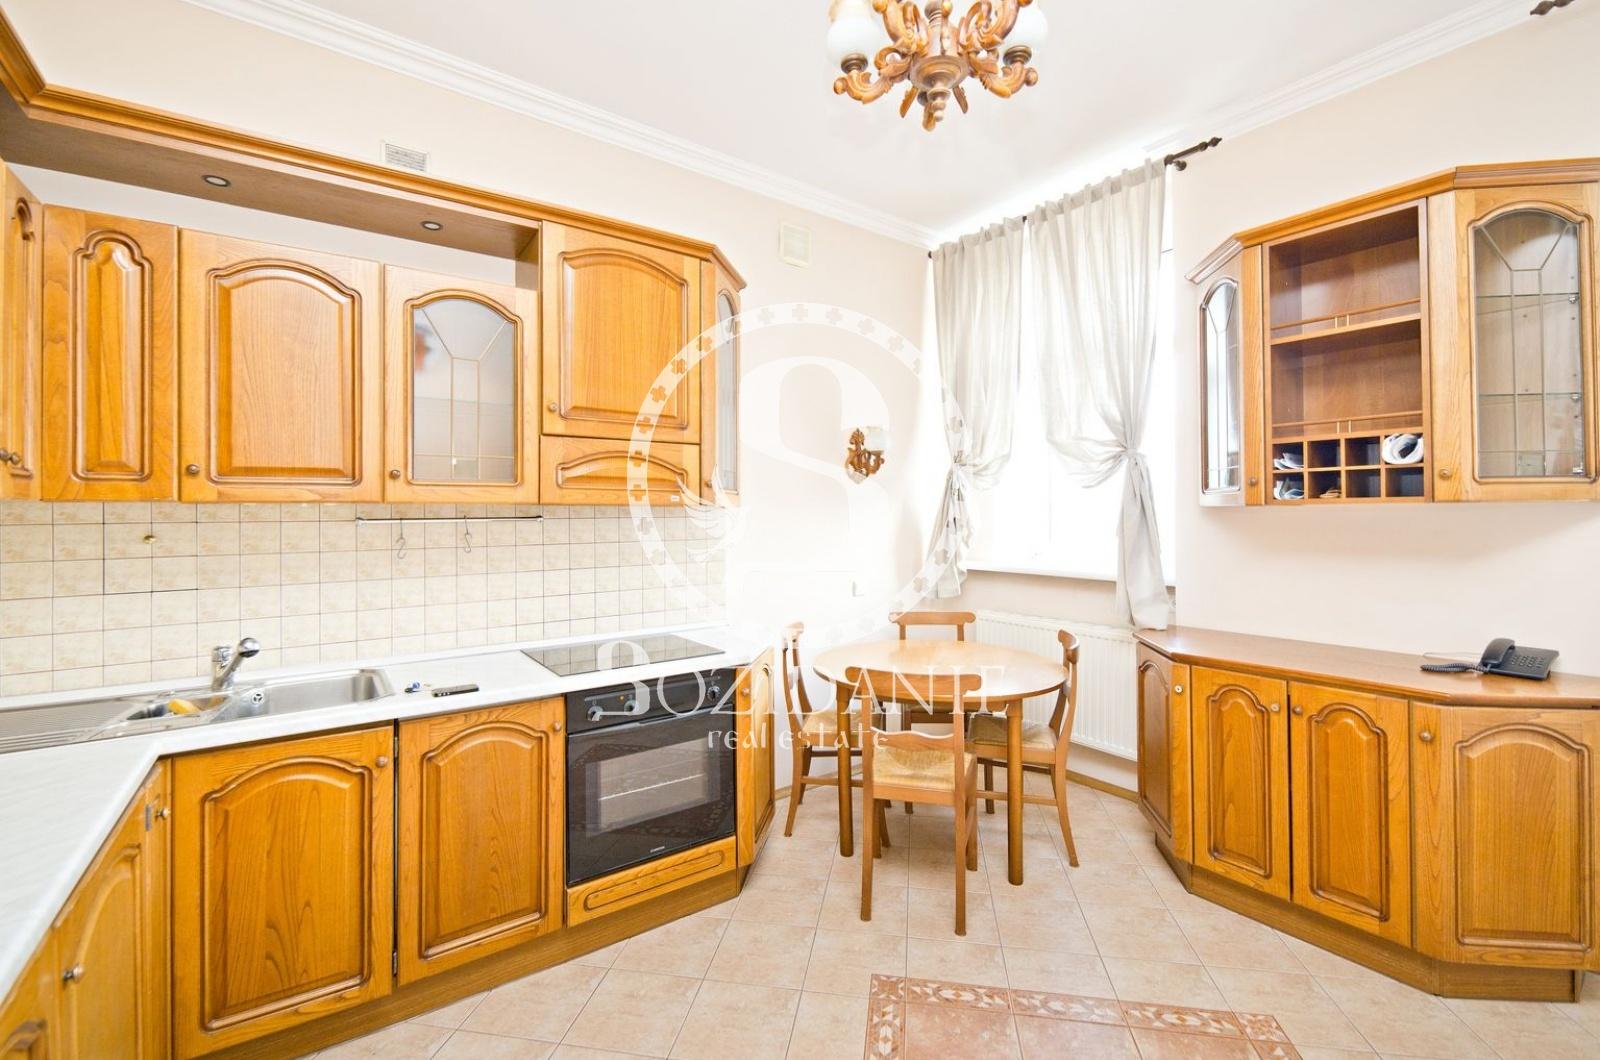 4 Комнаты, Городская, Аренда, 1-й Самотечный переулок, Listing ID 1197, Москва, Россия,